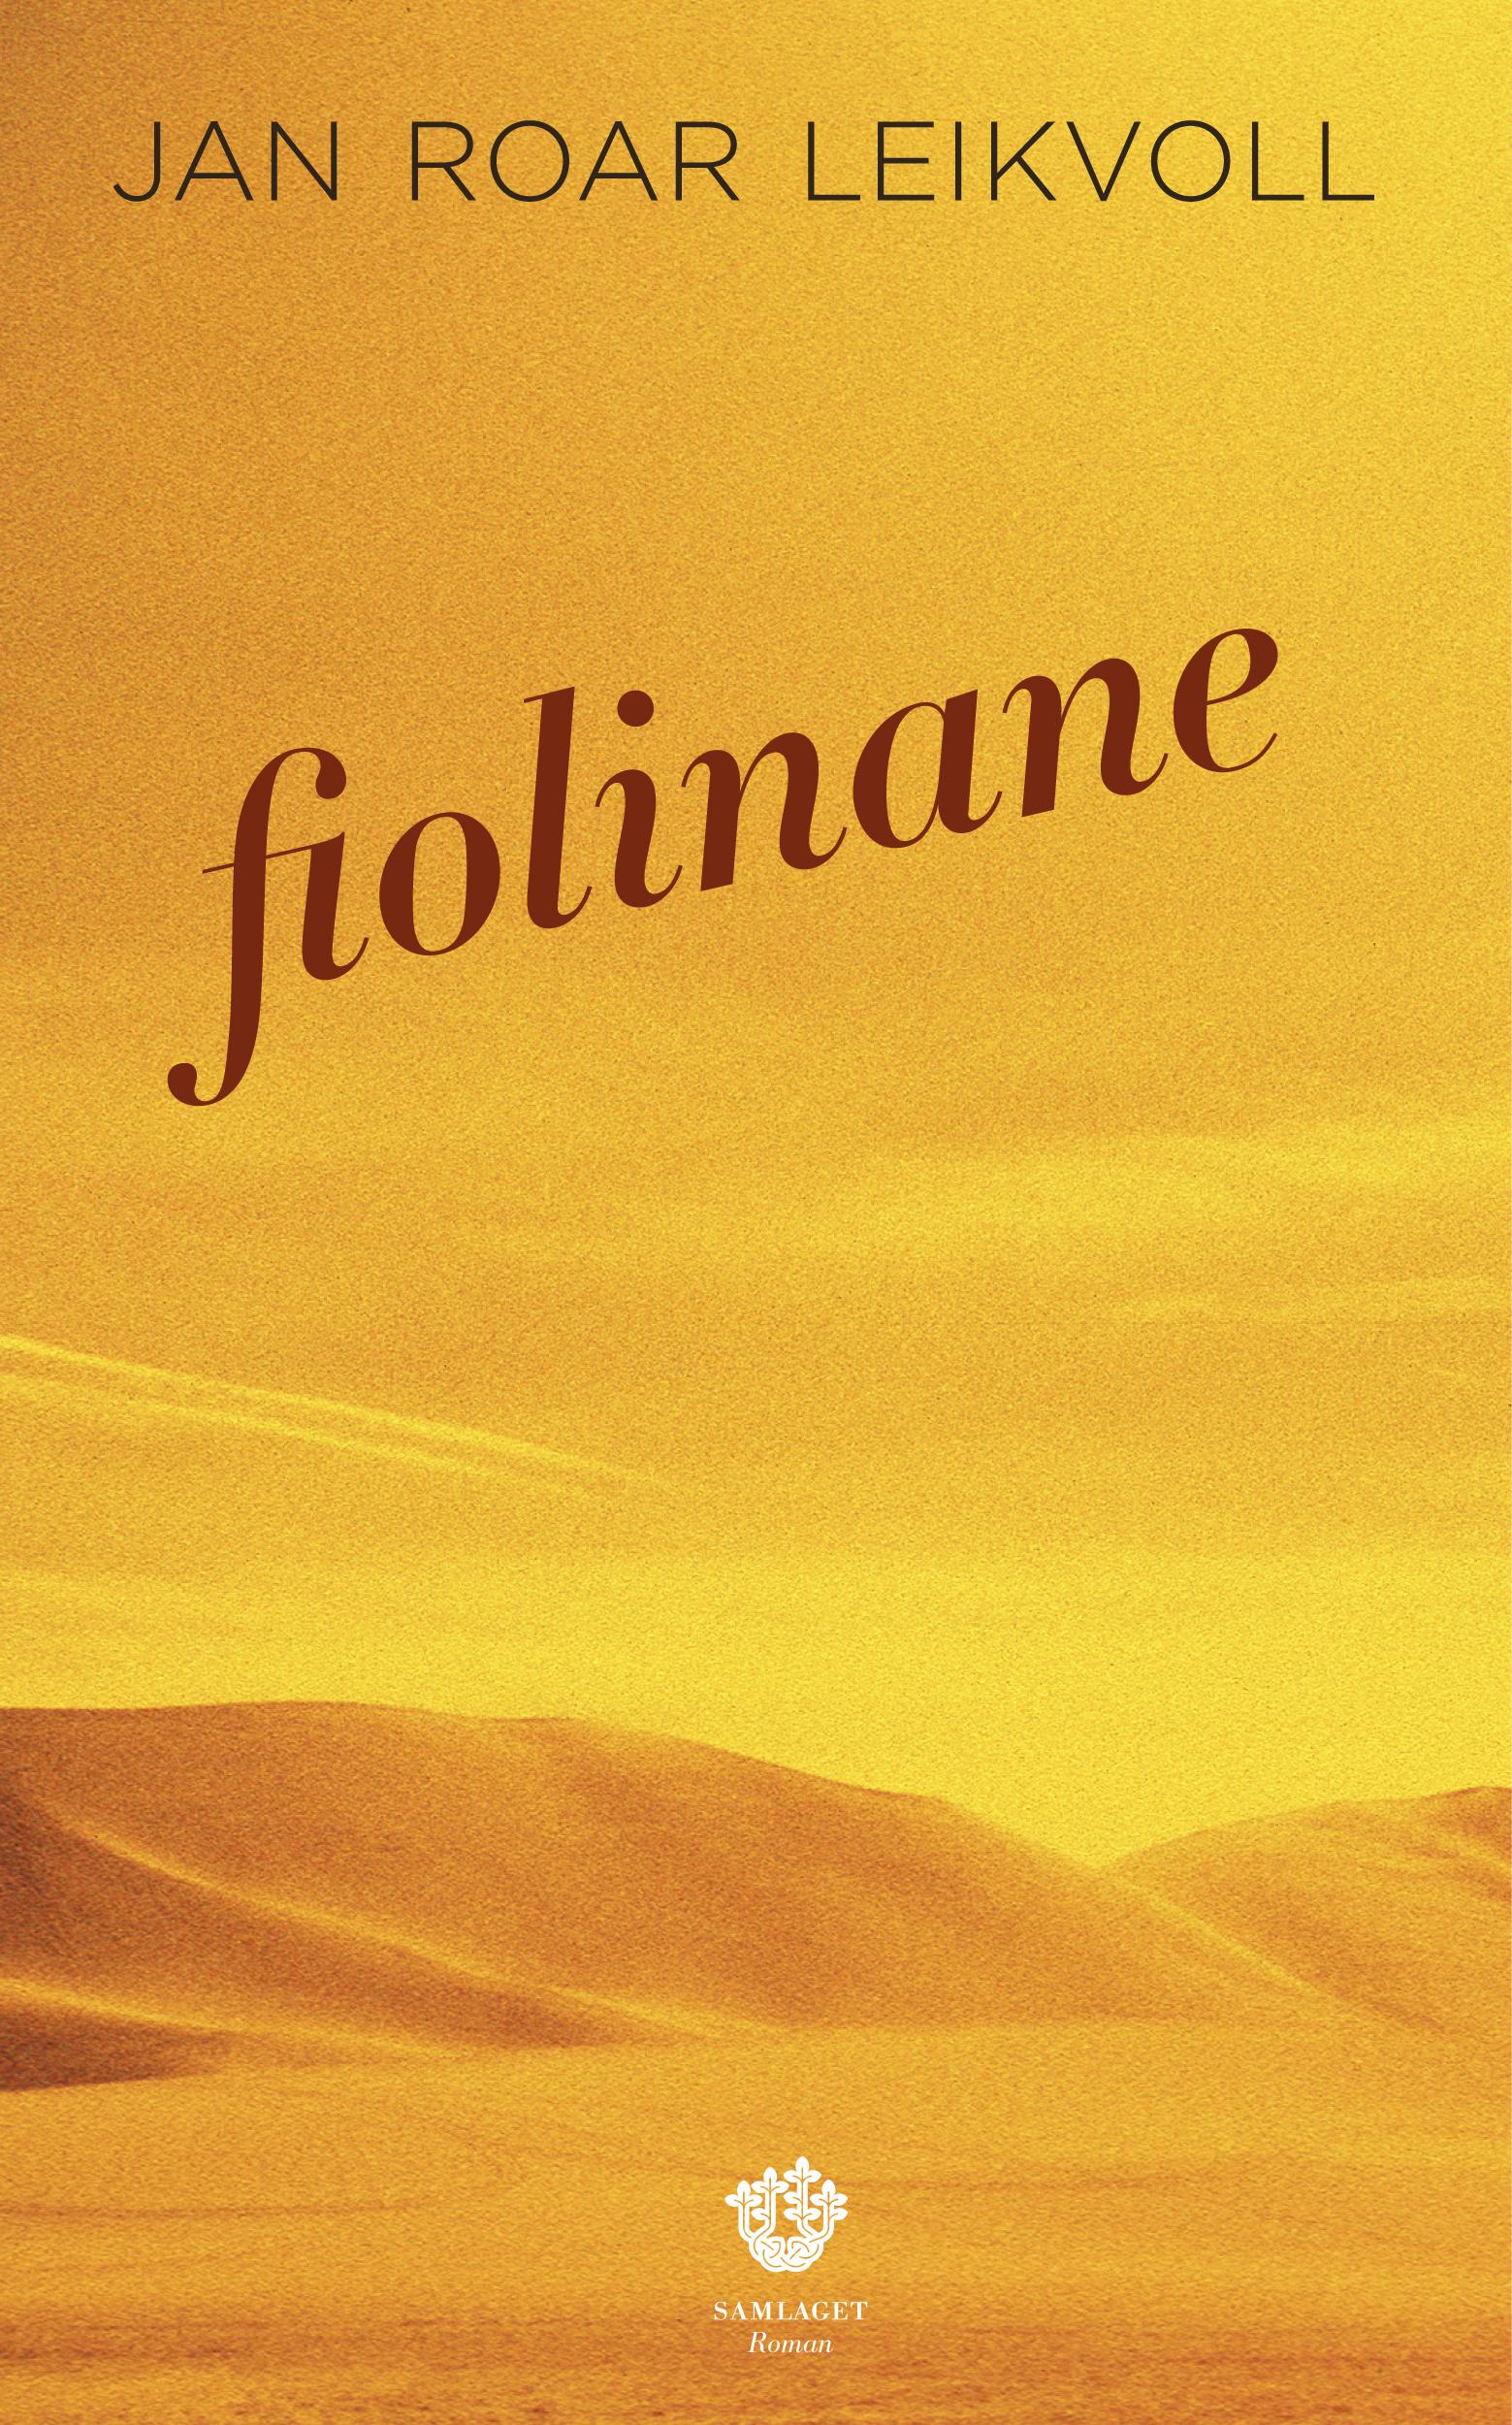 Fiolinane.ashx